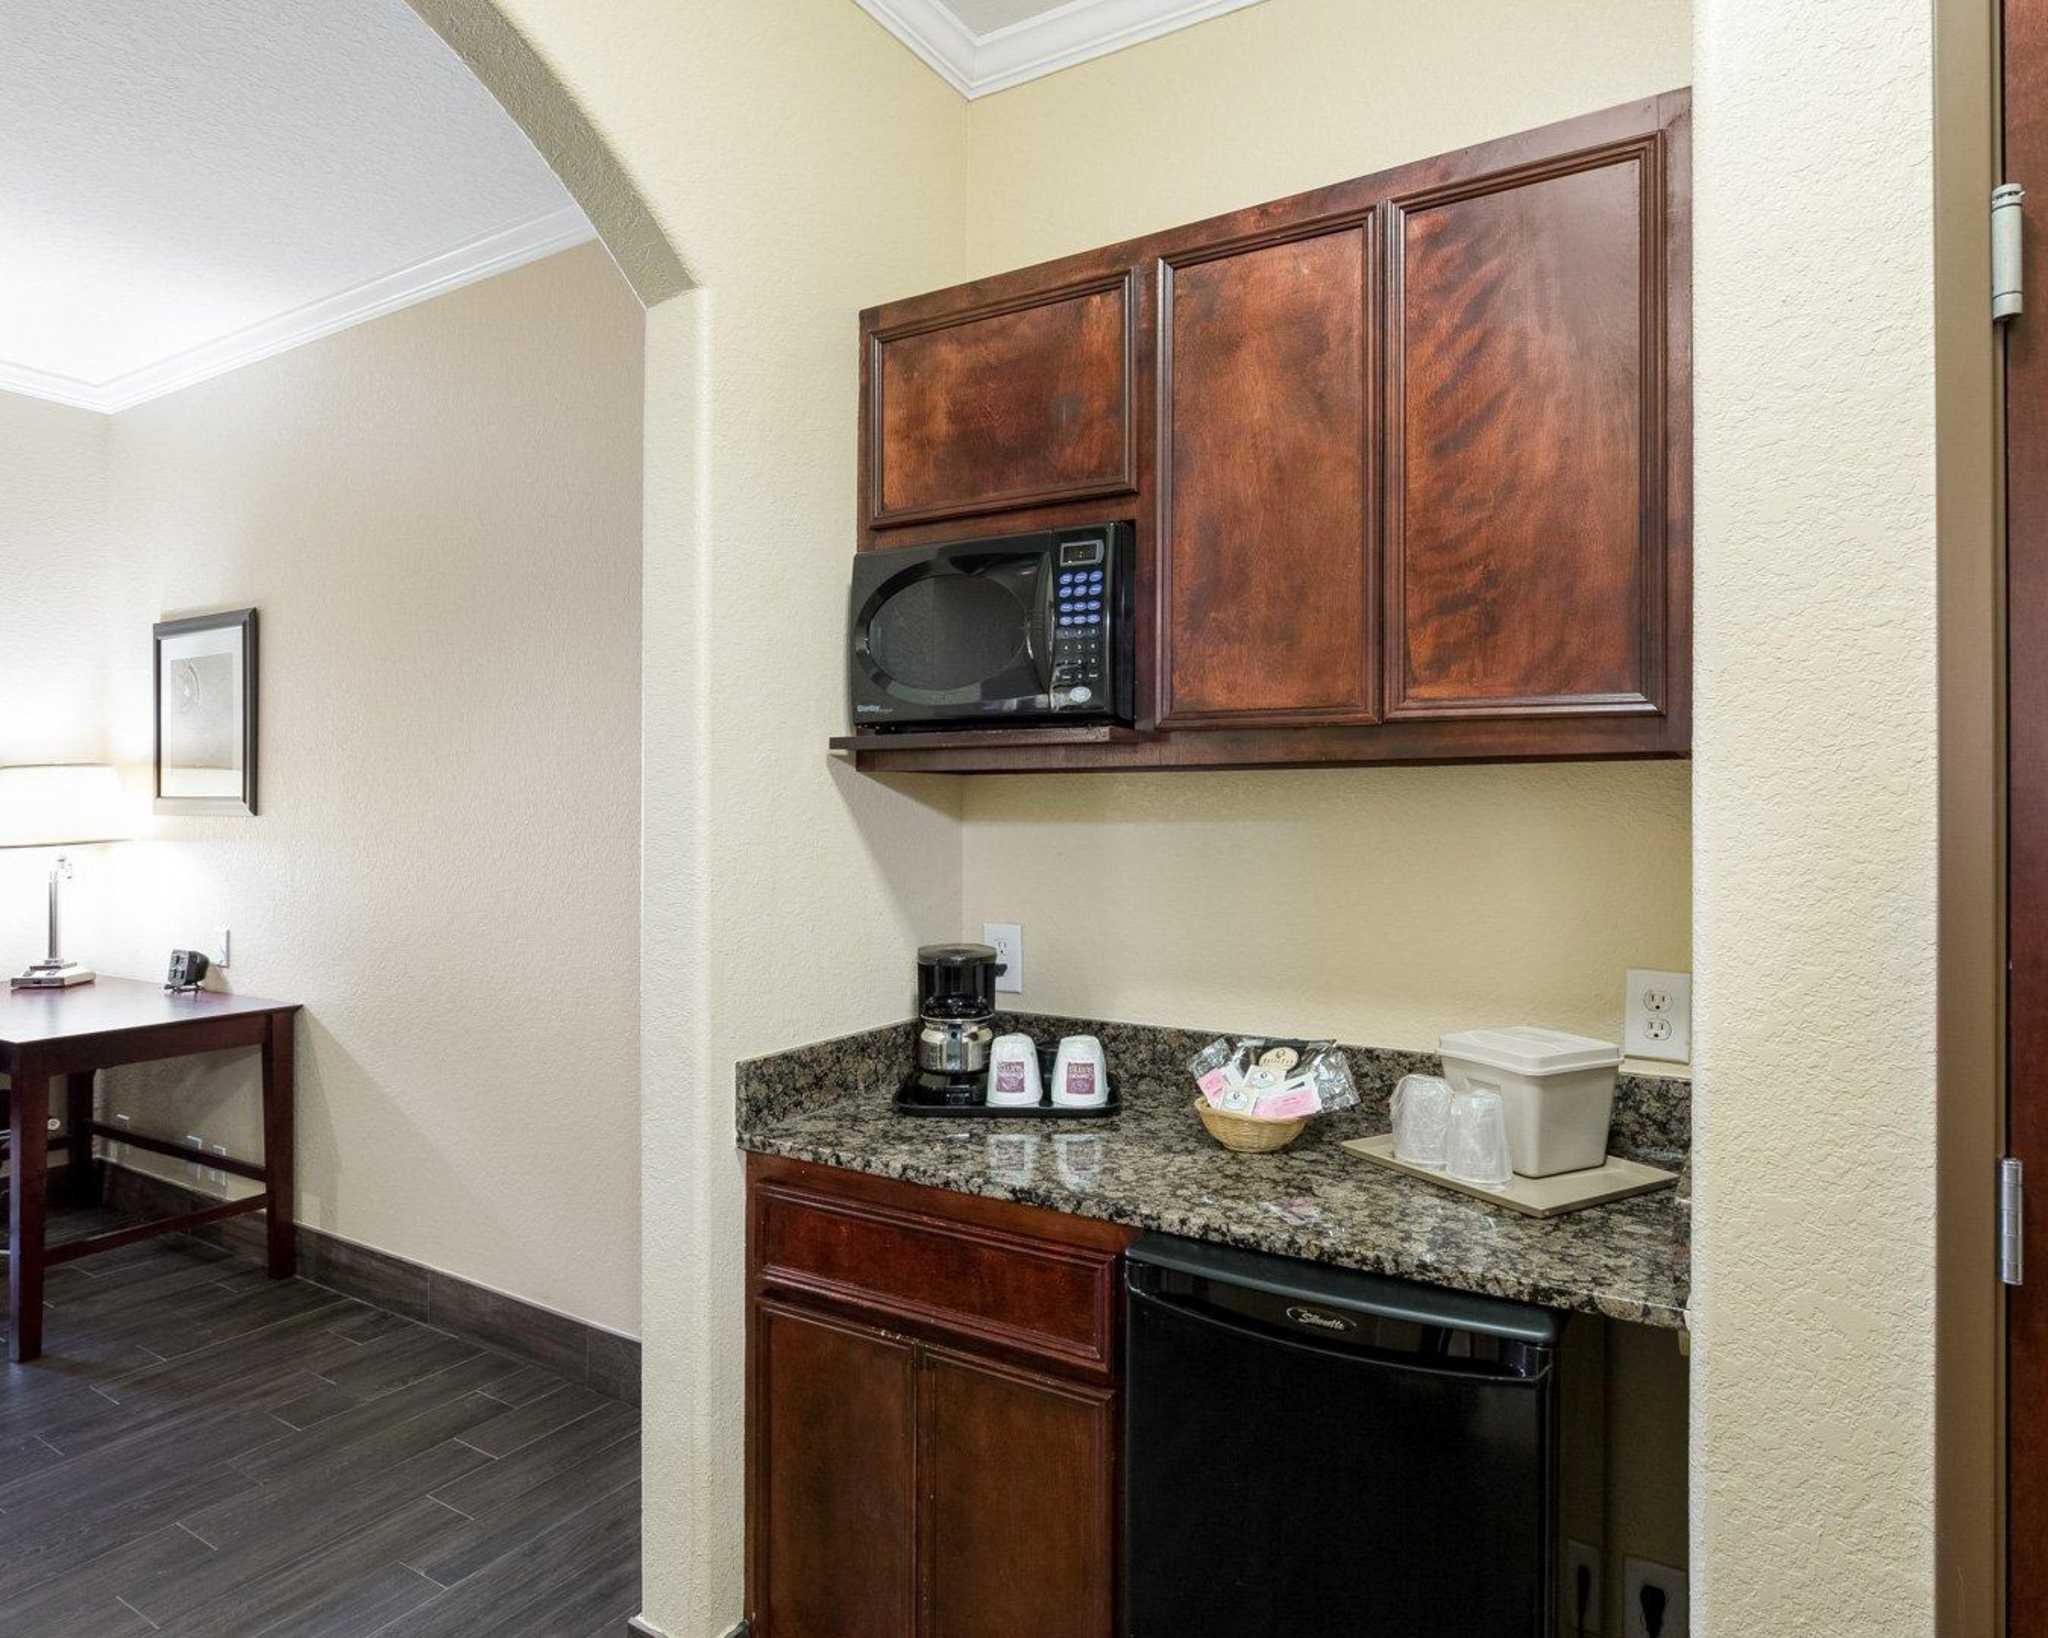 Comfort Suites image 44